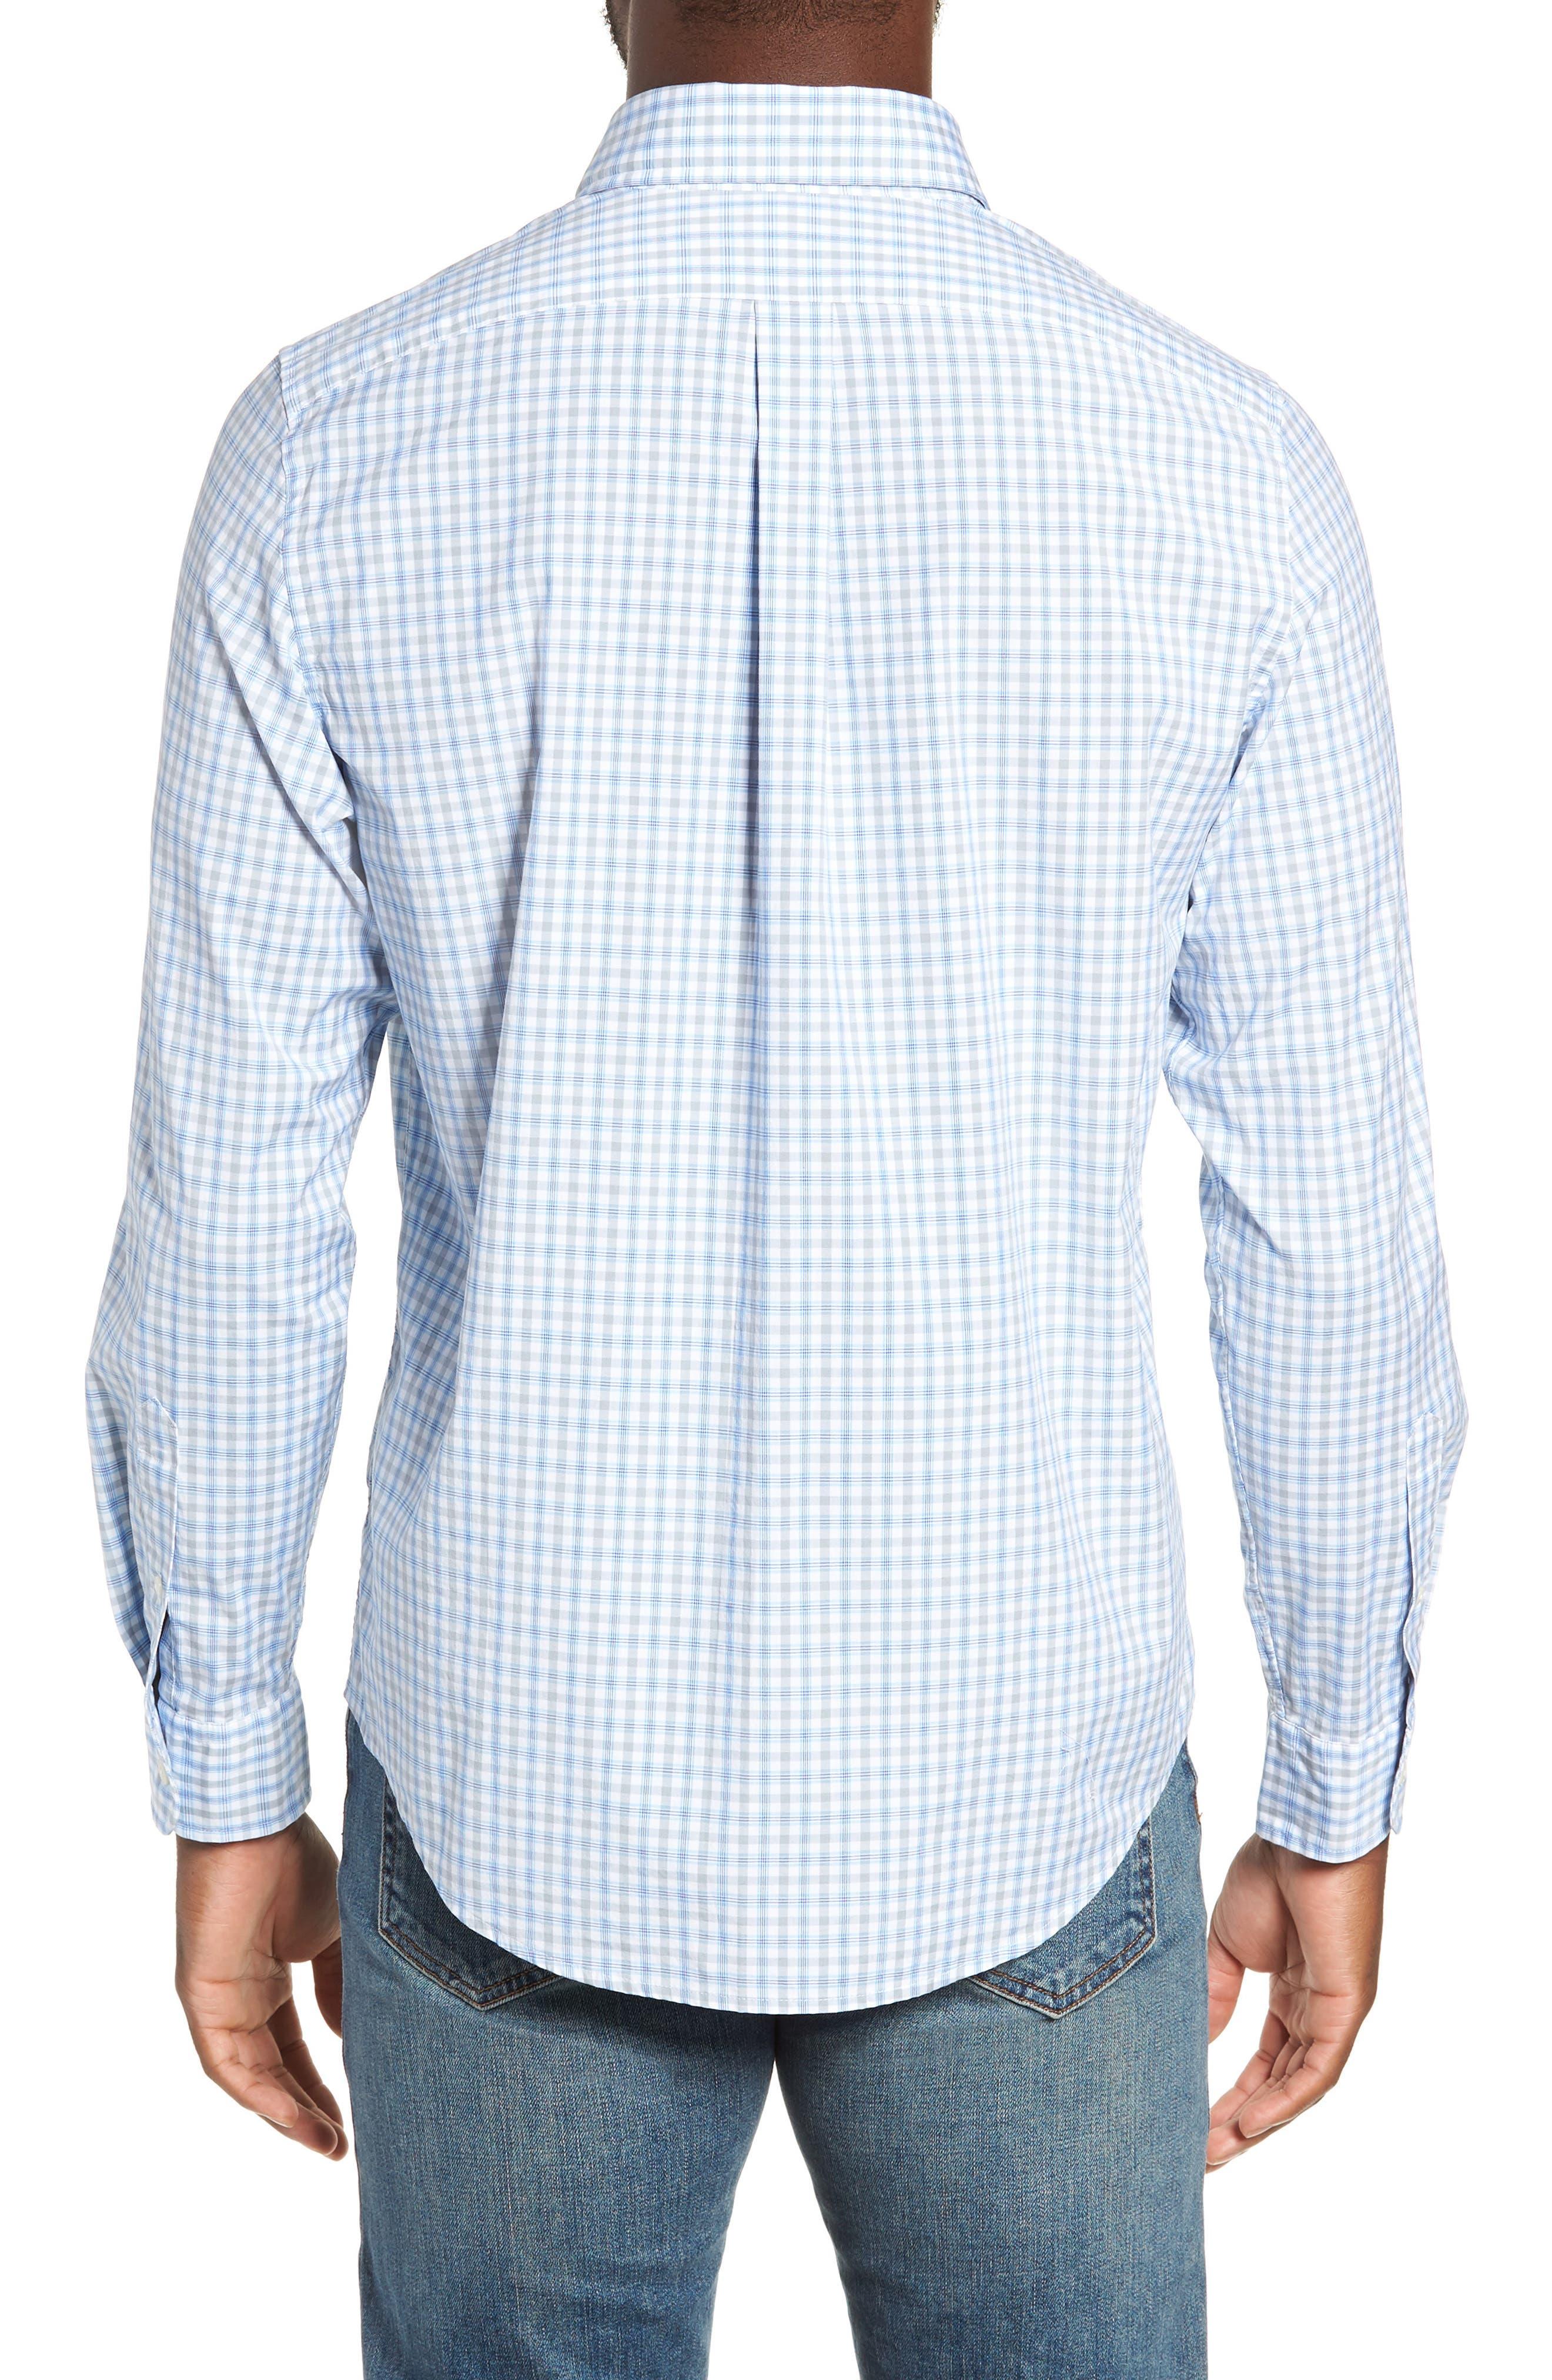 VINEYARD VINES,                             Murray Slim Fit Sport Shirt,                             Alternate thumbnail 3, color,                             034